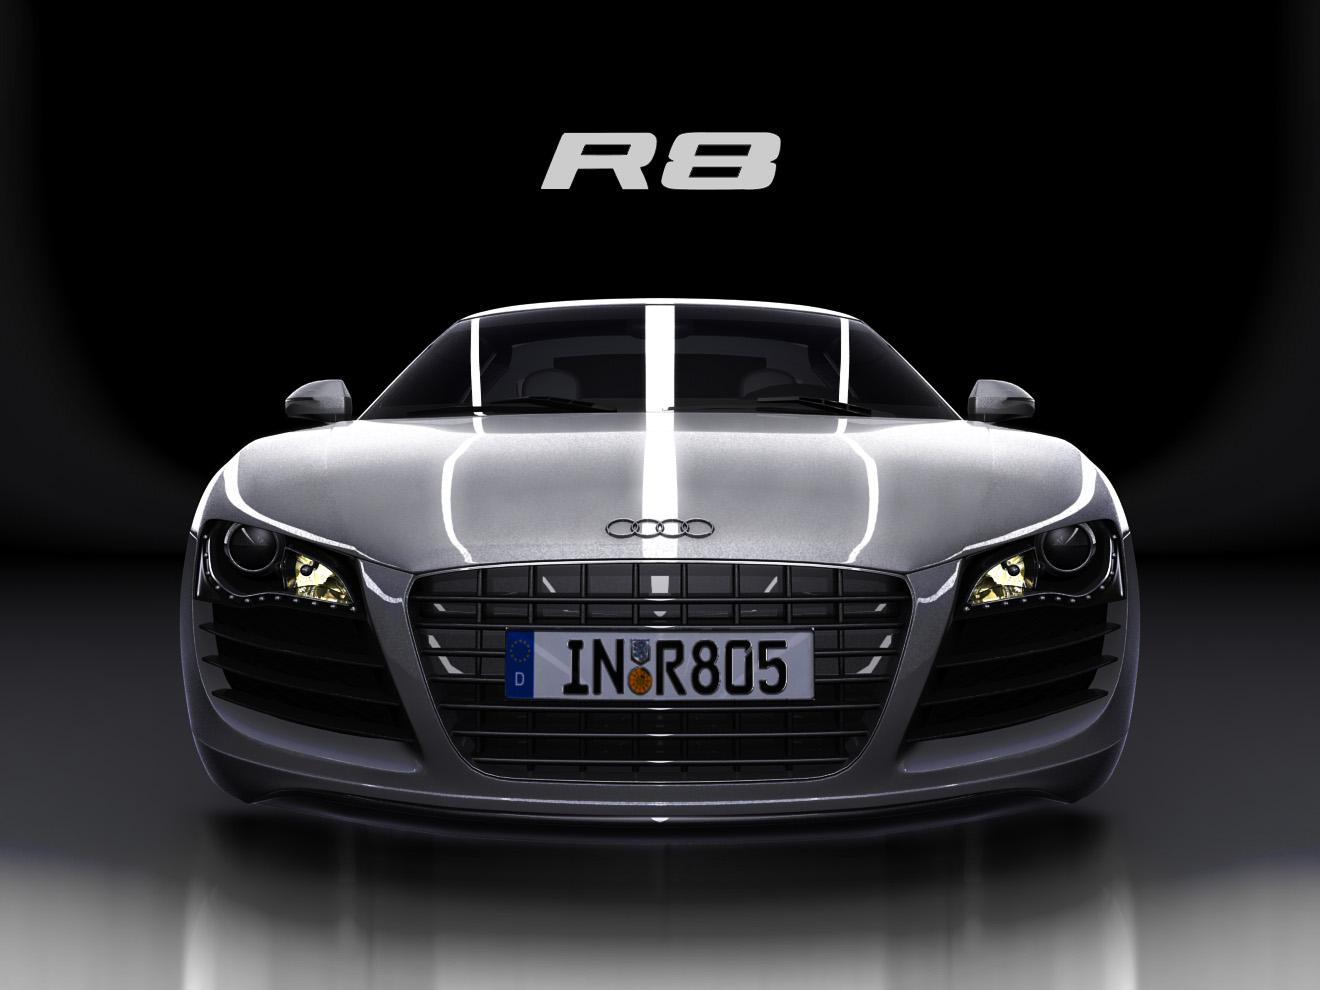 Audi-R-HD-wallpaper-wp423798-1